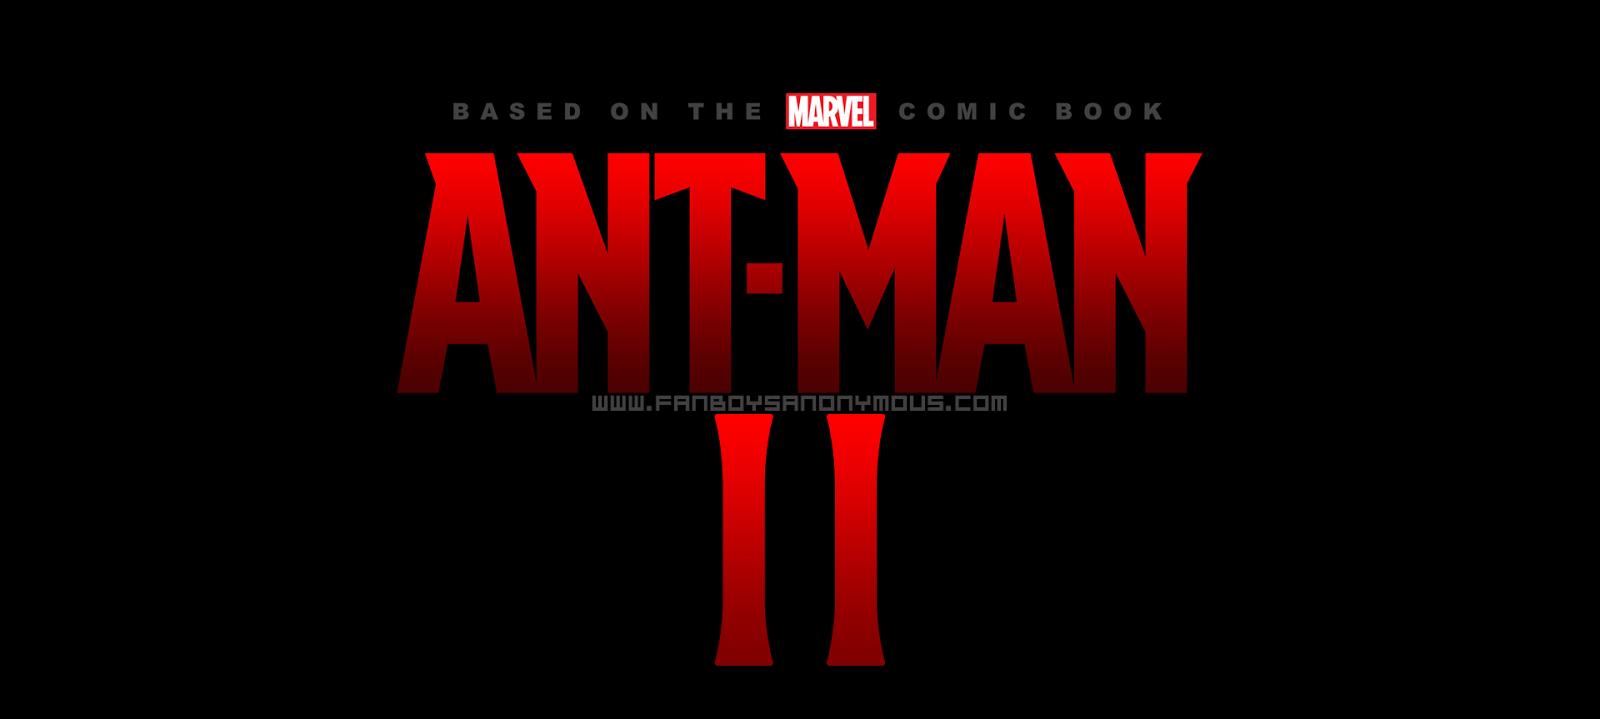 Marvel's Ant-Man sequel logo wallpaper